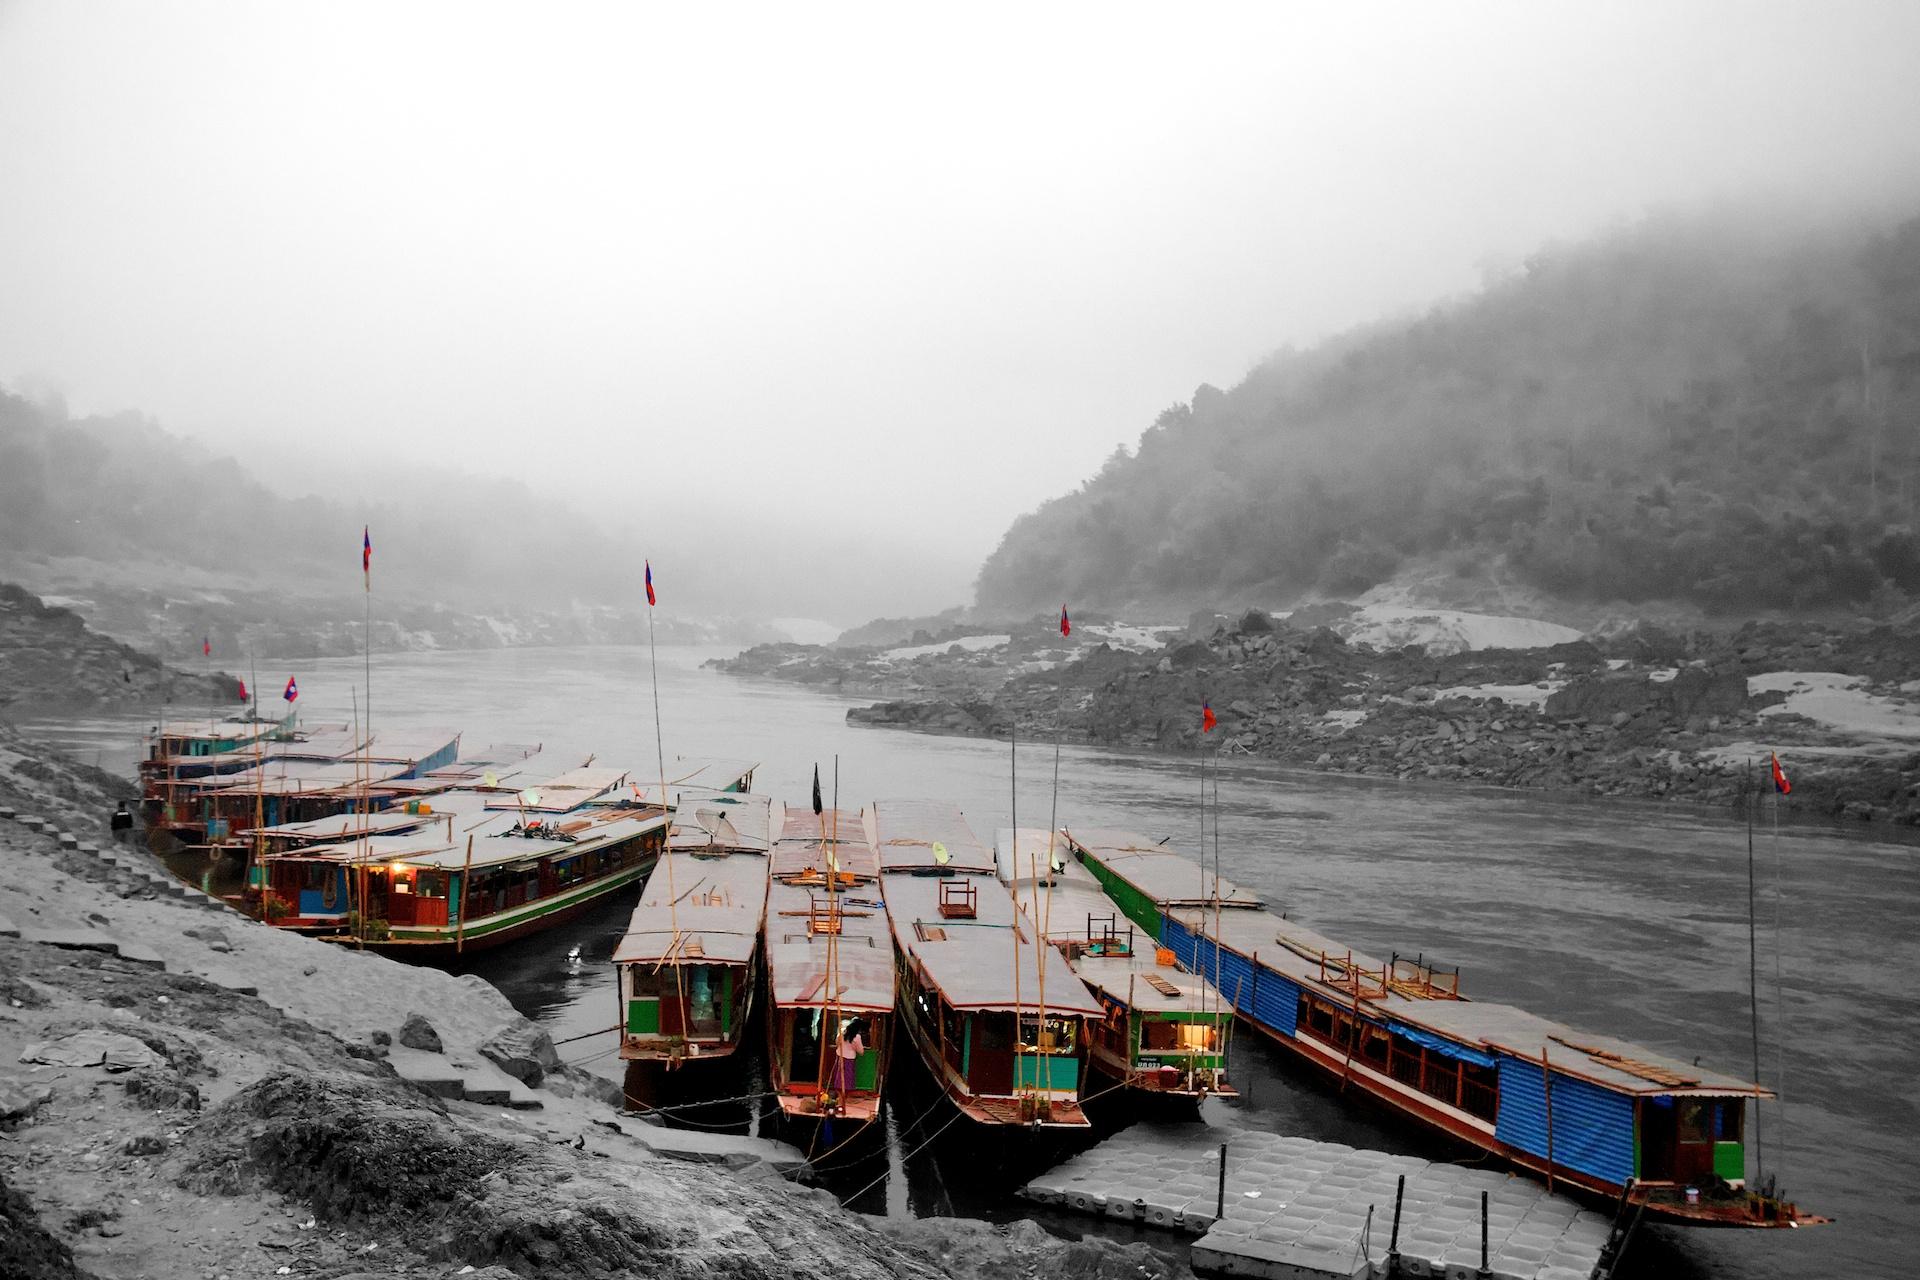 Mekong River Docks